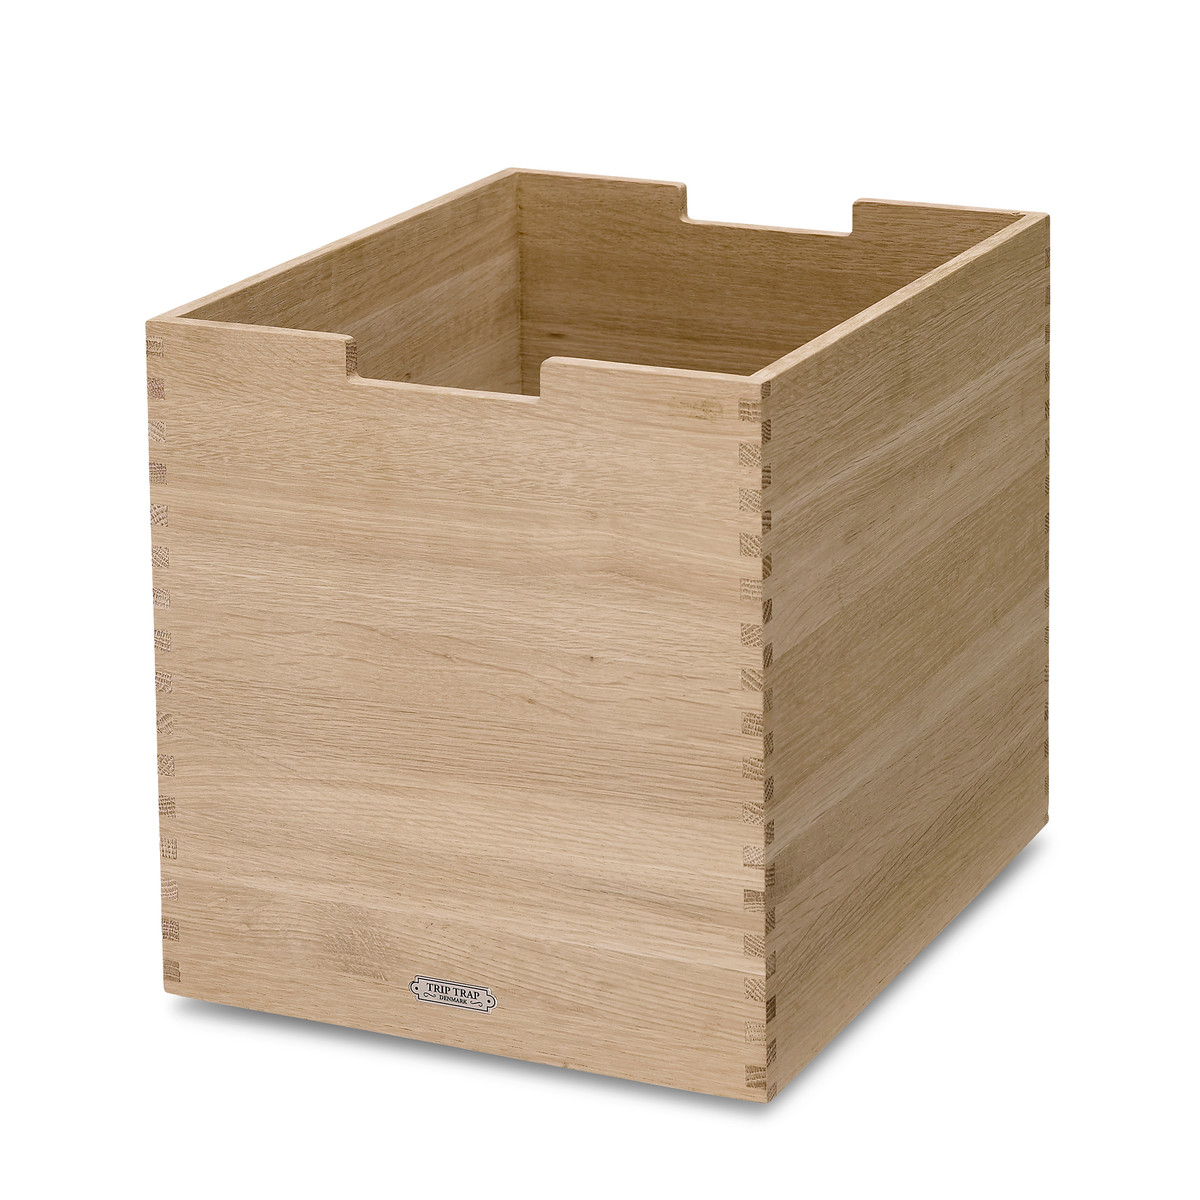 Grande boîte avec roulettes en chêne